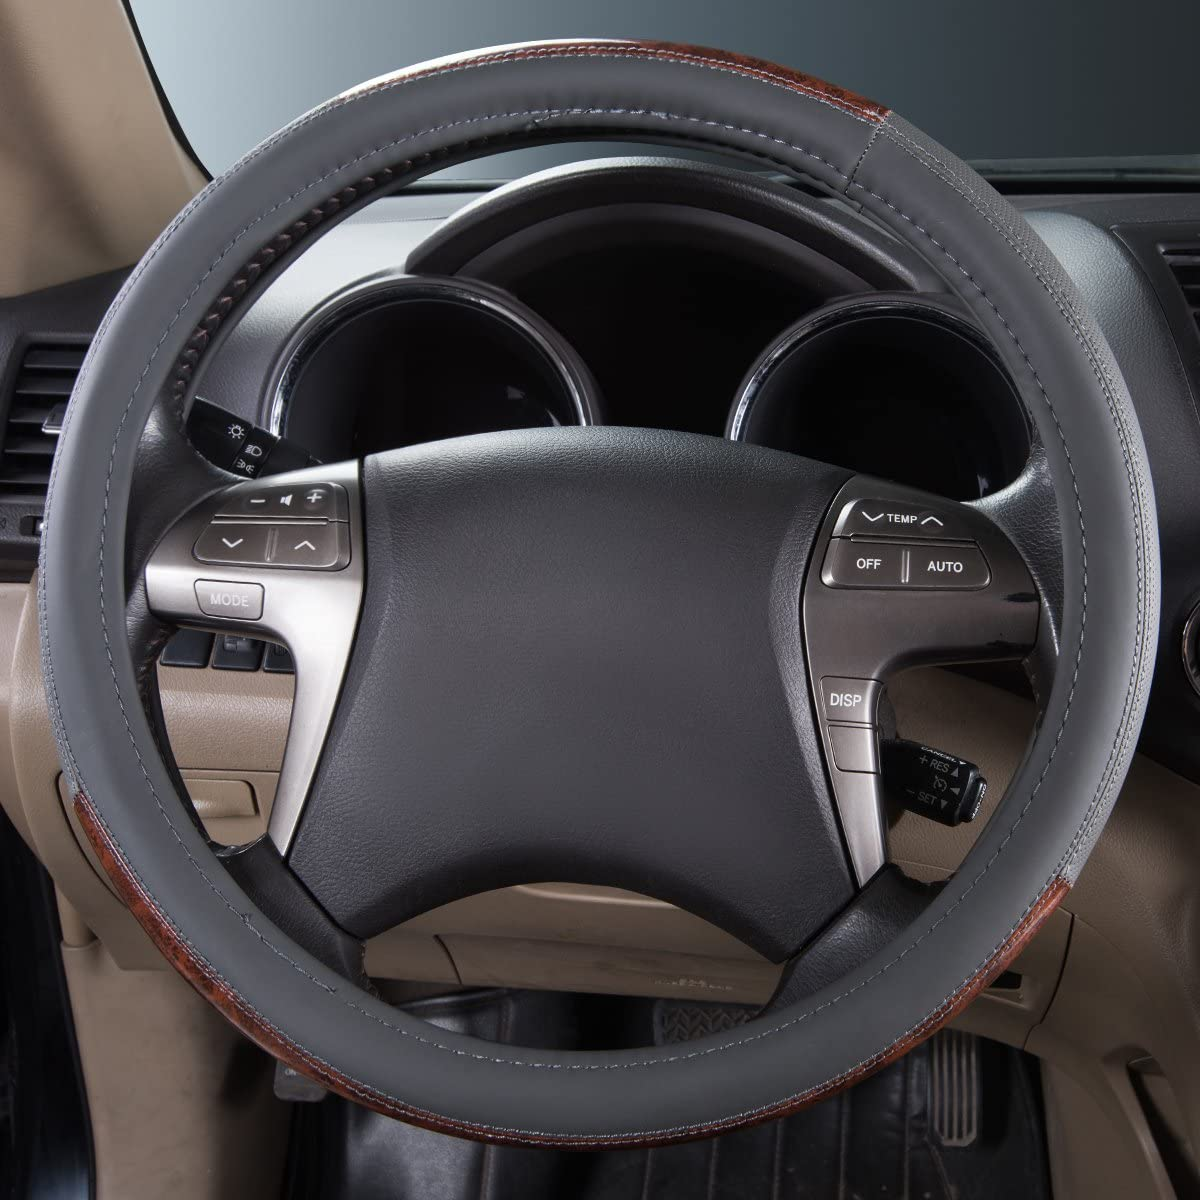 Car Pass Universal Auto Lenkradhülle Lenkrad Abdeckung Heavy Duty Lenkradbezug Aus Echtes Leder 38cm 15 Anti Rutsch Lenkradabdeckung Lenkradschoner Auto